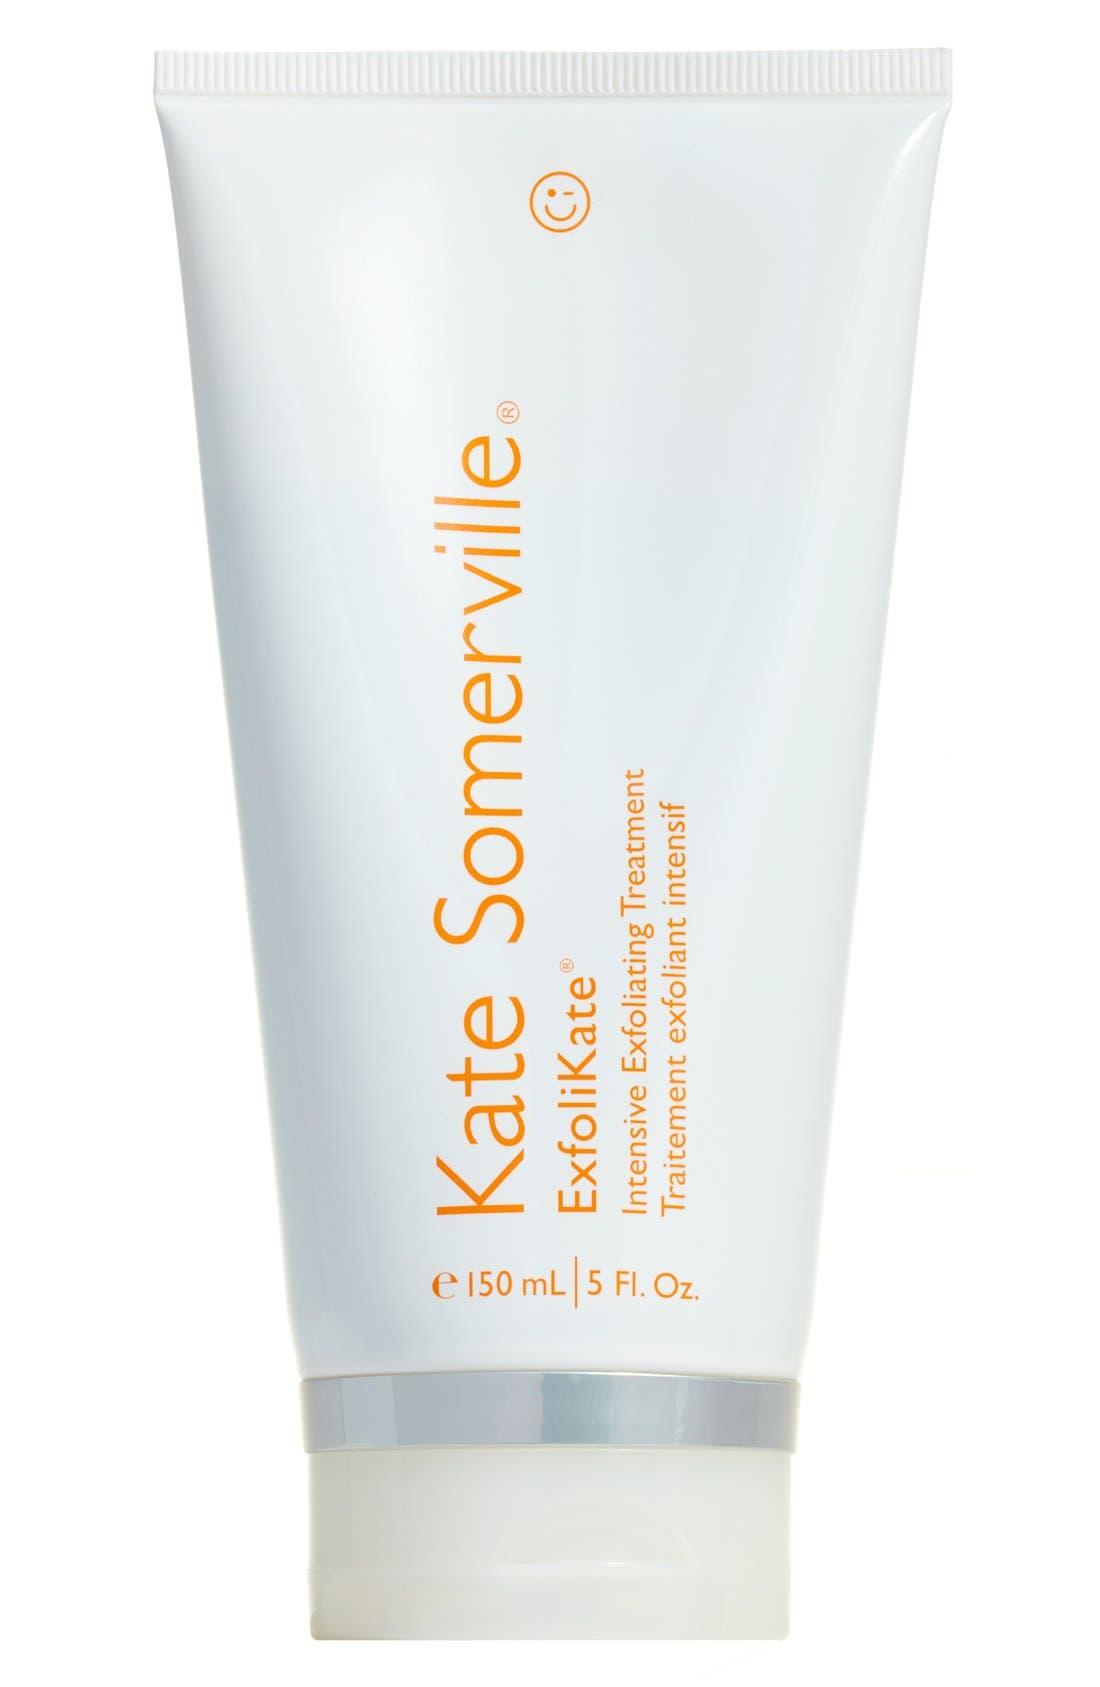 Kate Somerville® ExfoliKate® Intensive Exfoliating Treatment ($213 Value)